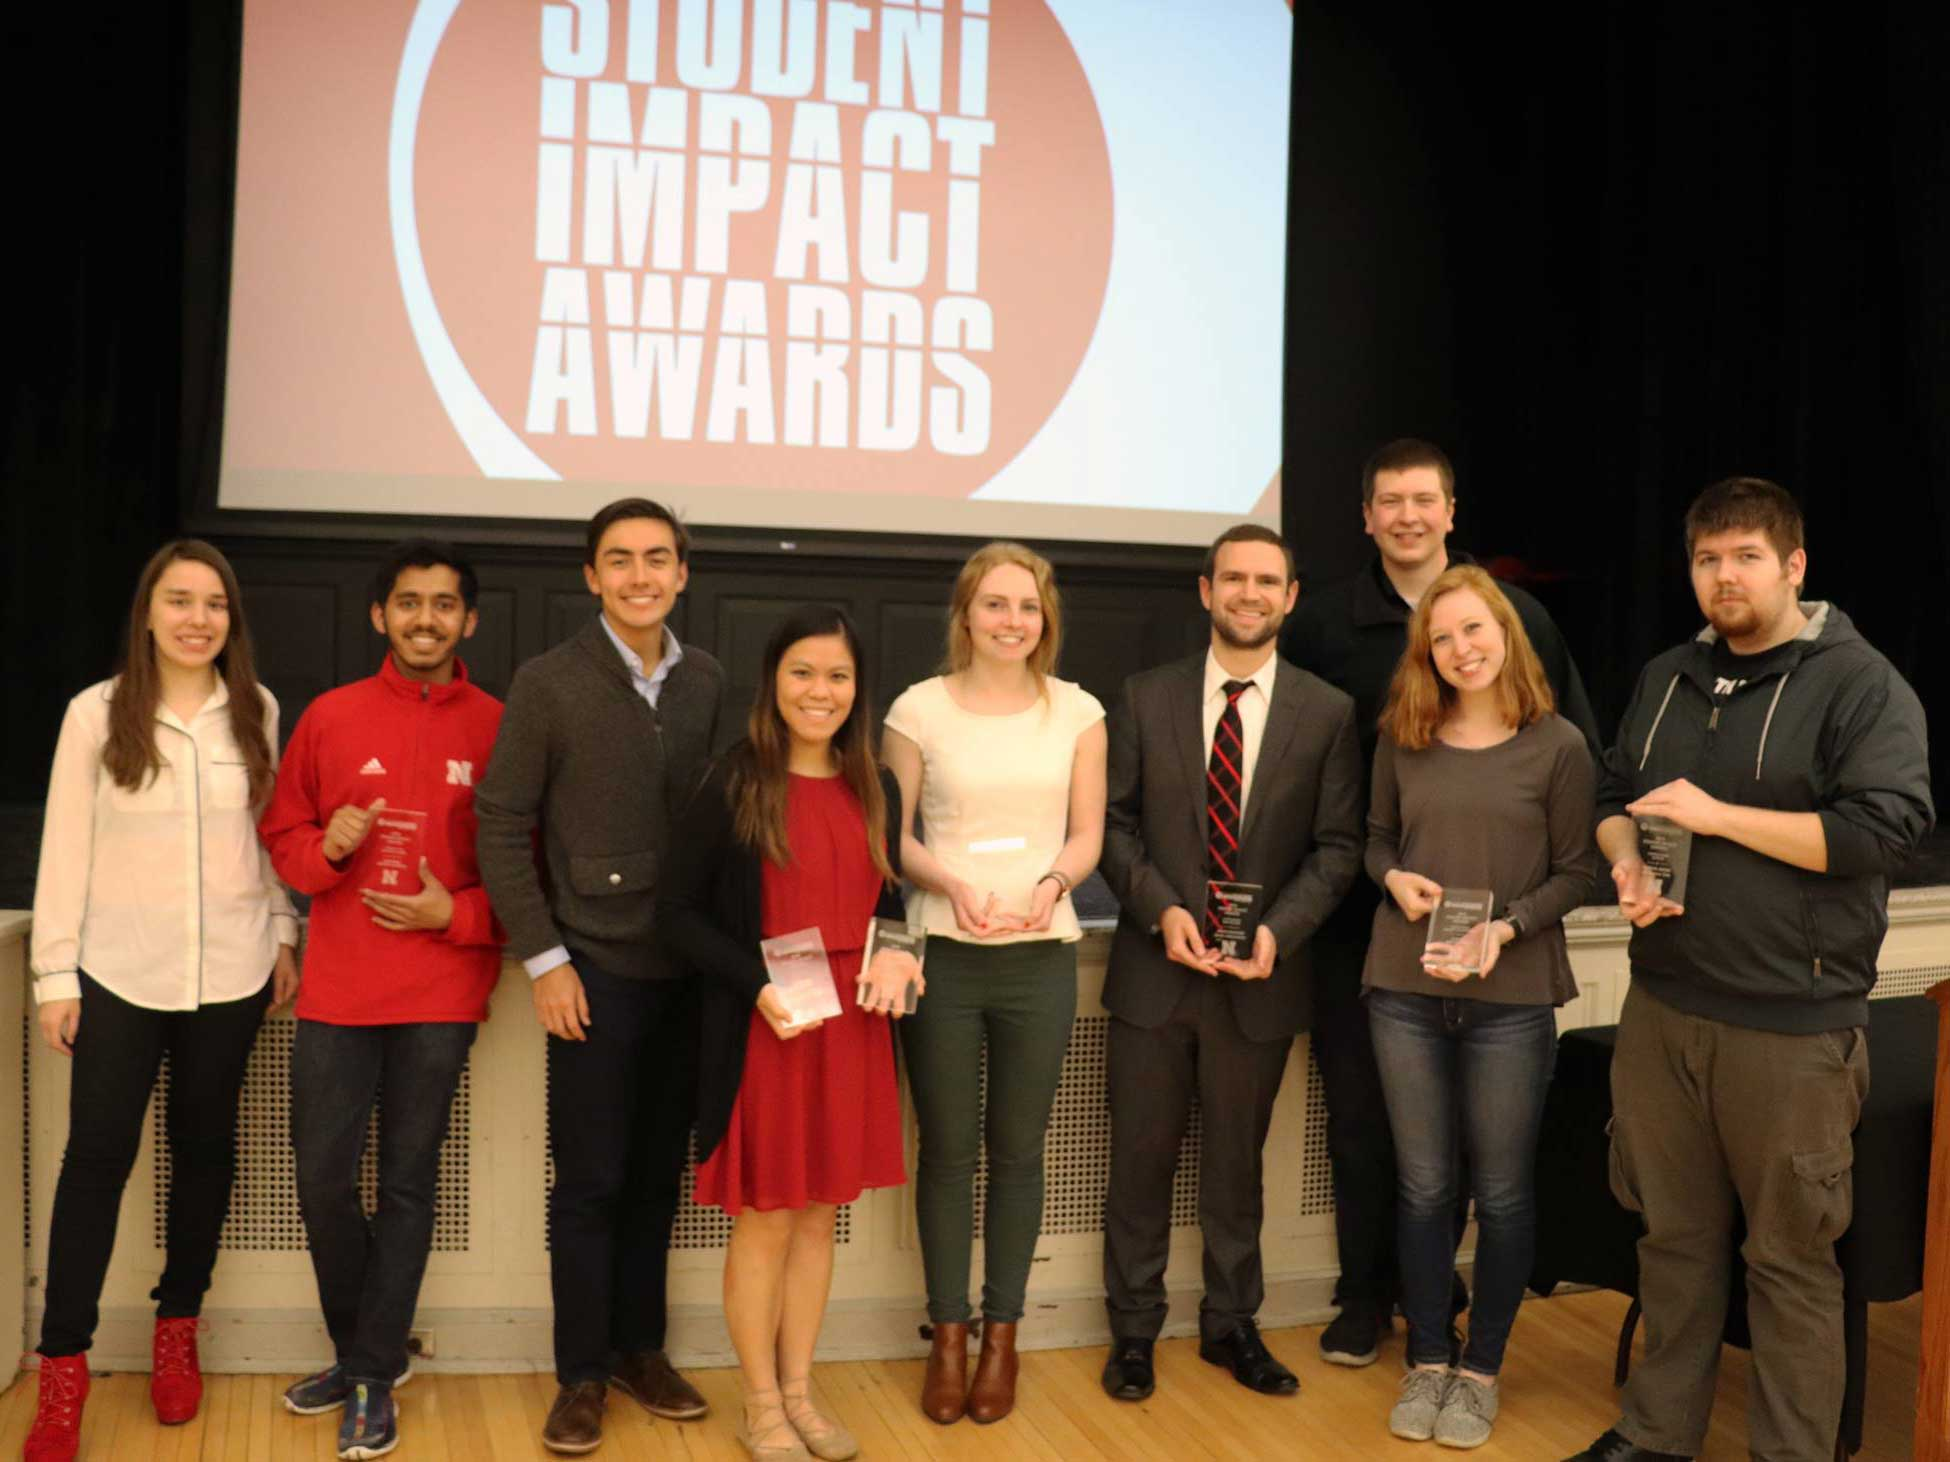 2017-2018 recipients of the Student Impact awards at Nebraska